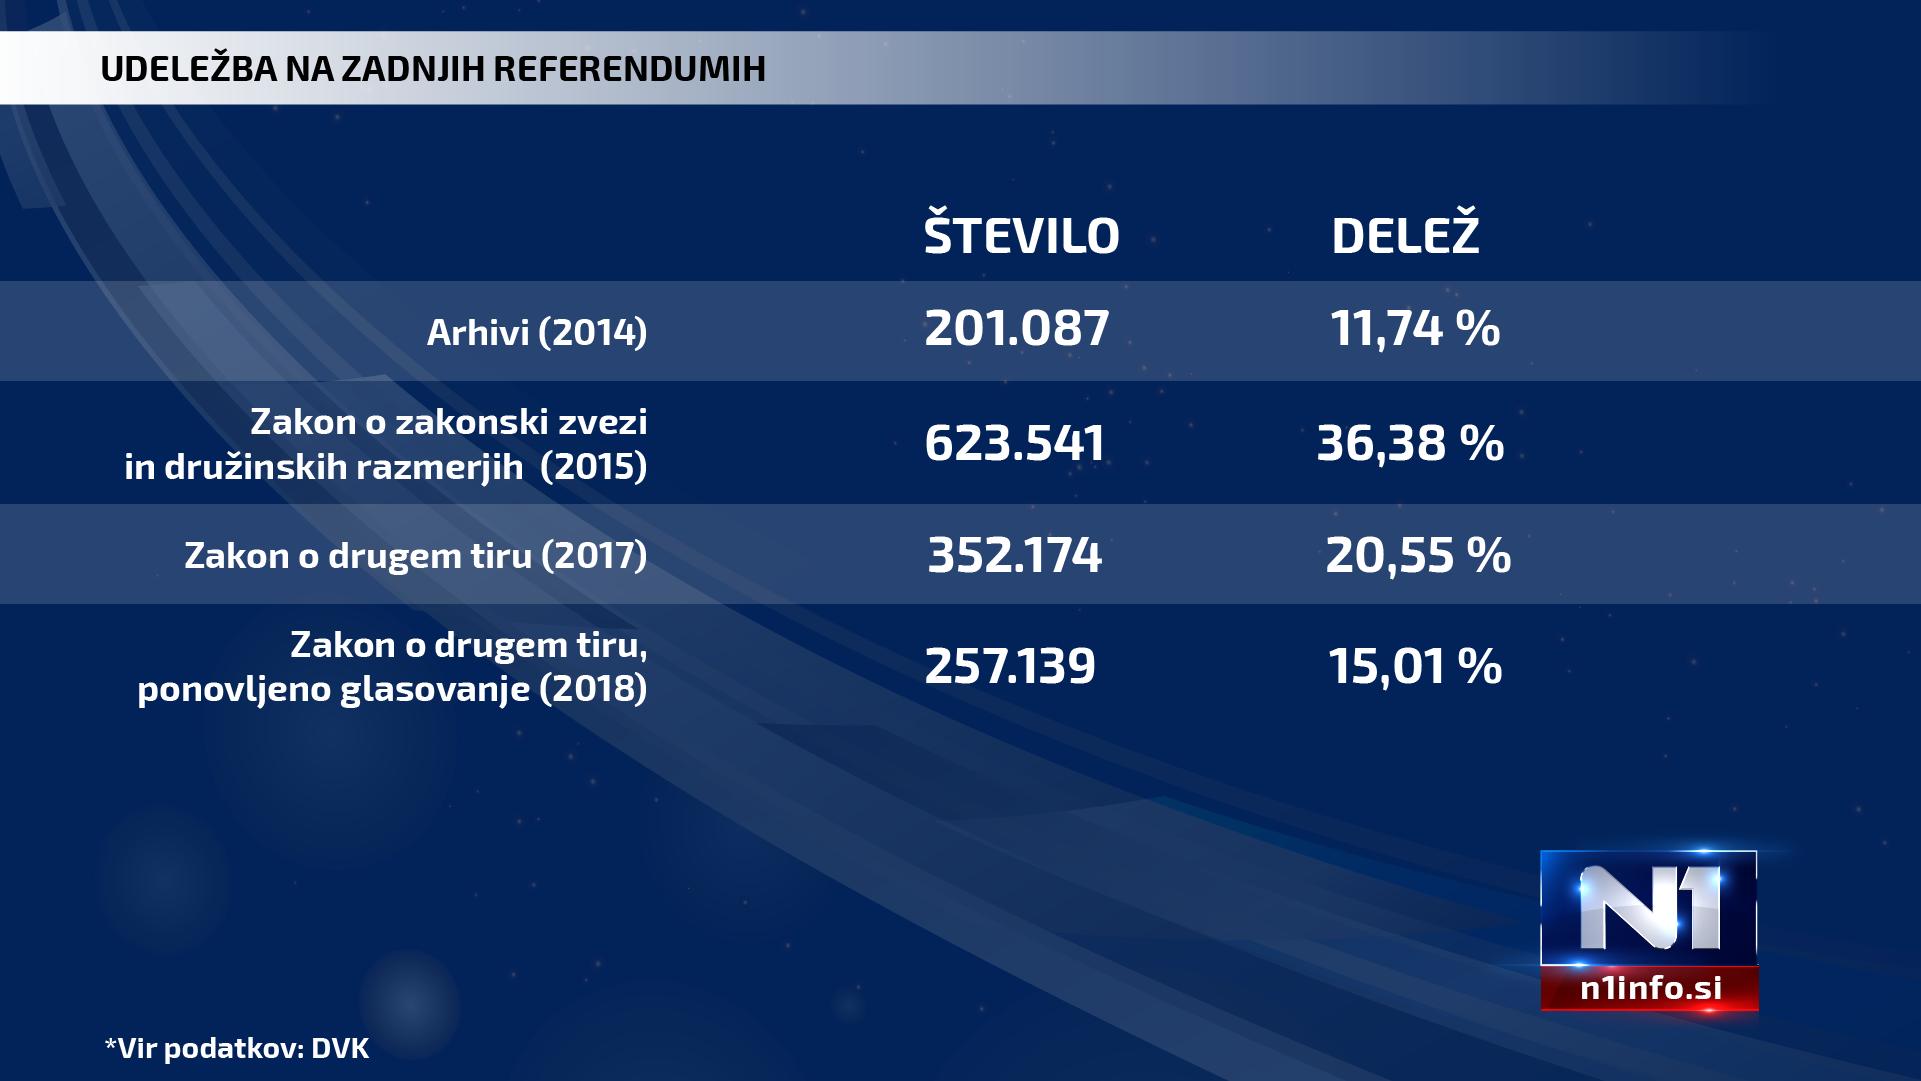 Udeležba referendum